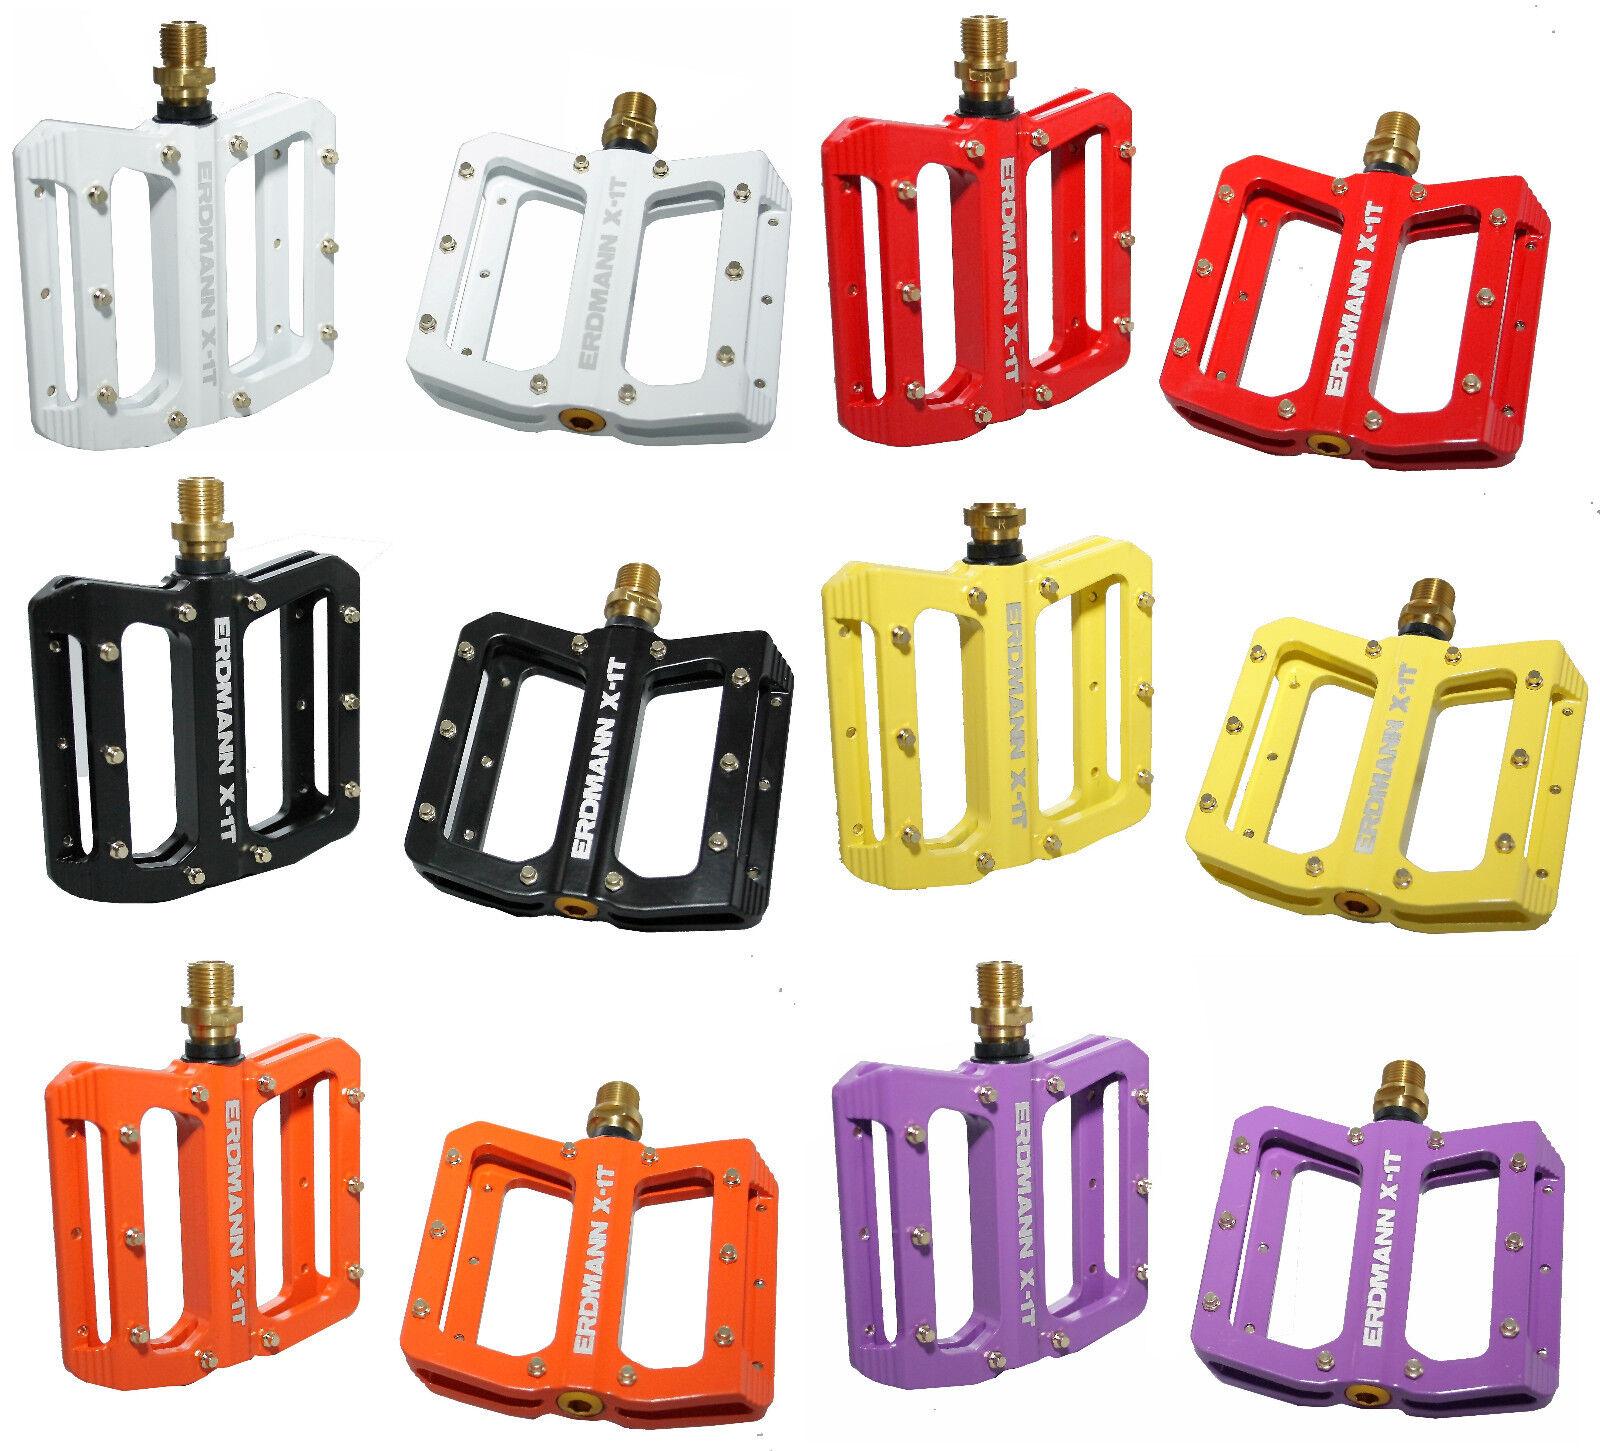 Magnesium Platform Pedals Erdmann X-1 Titanium with Spindle in Various Colours